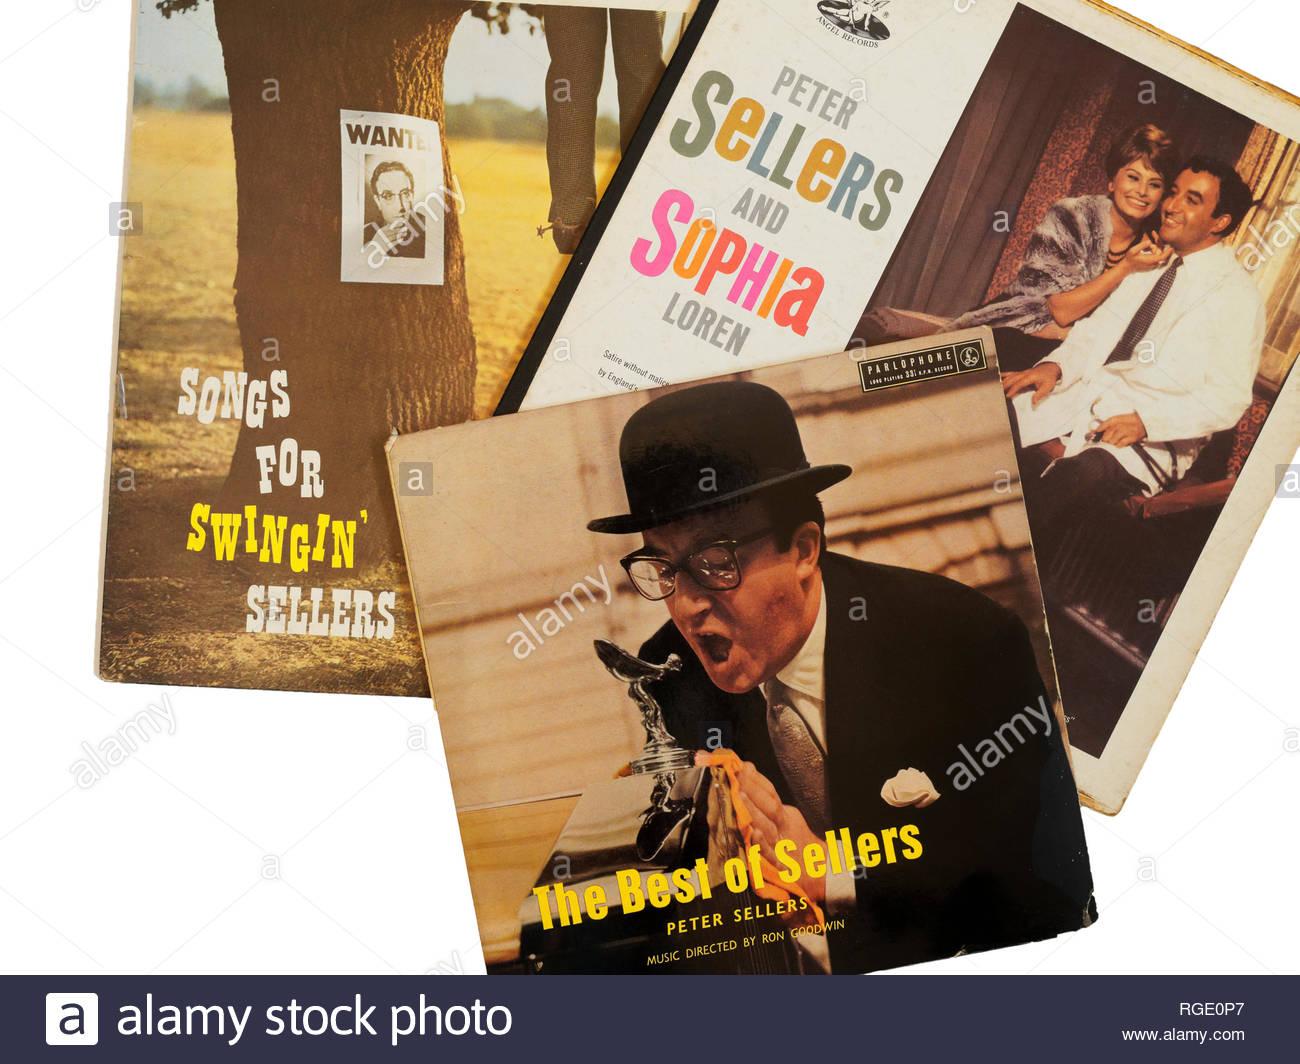 Peter Sellers British humour Sofia Loren LP sixties humour - Stock Image